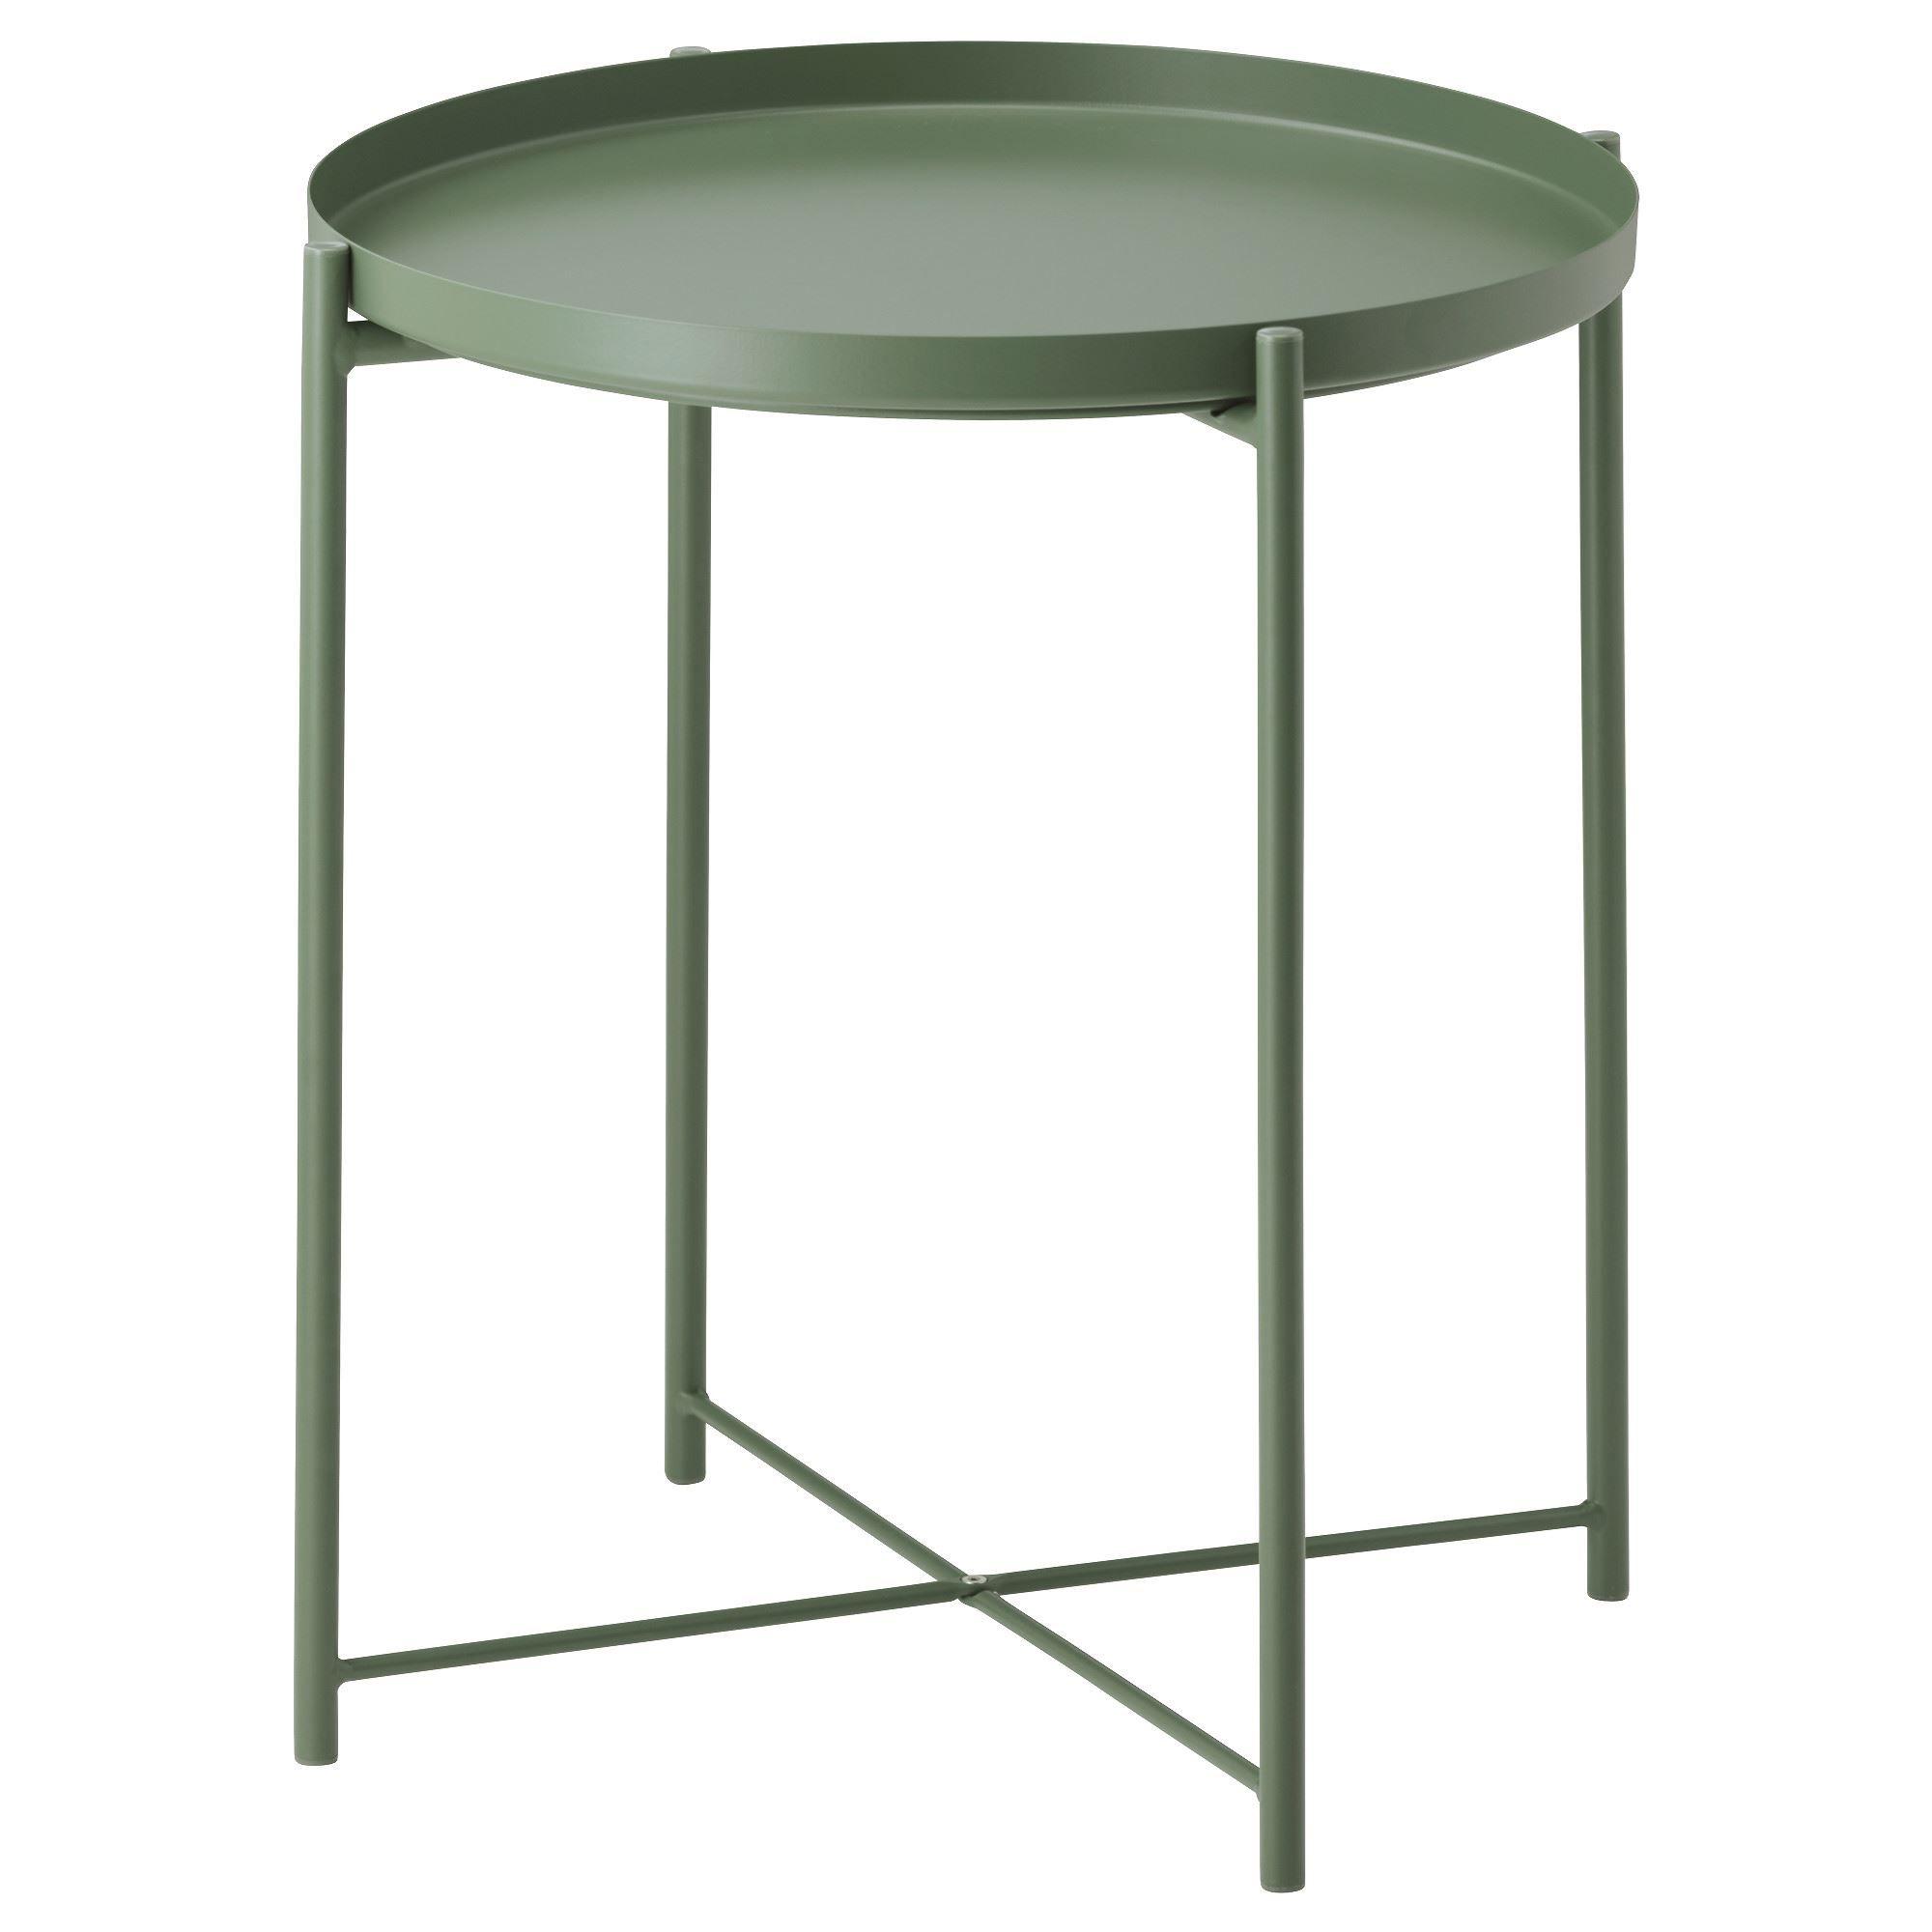 Gladom Tepsili Sehpa Koyu Yesil 45x53 Cm Ikea Oturma Odalari Ikea Oturma Odalari Furniture